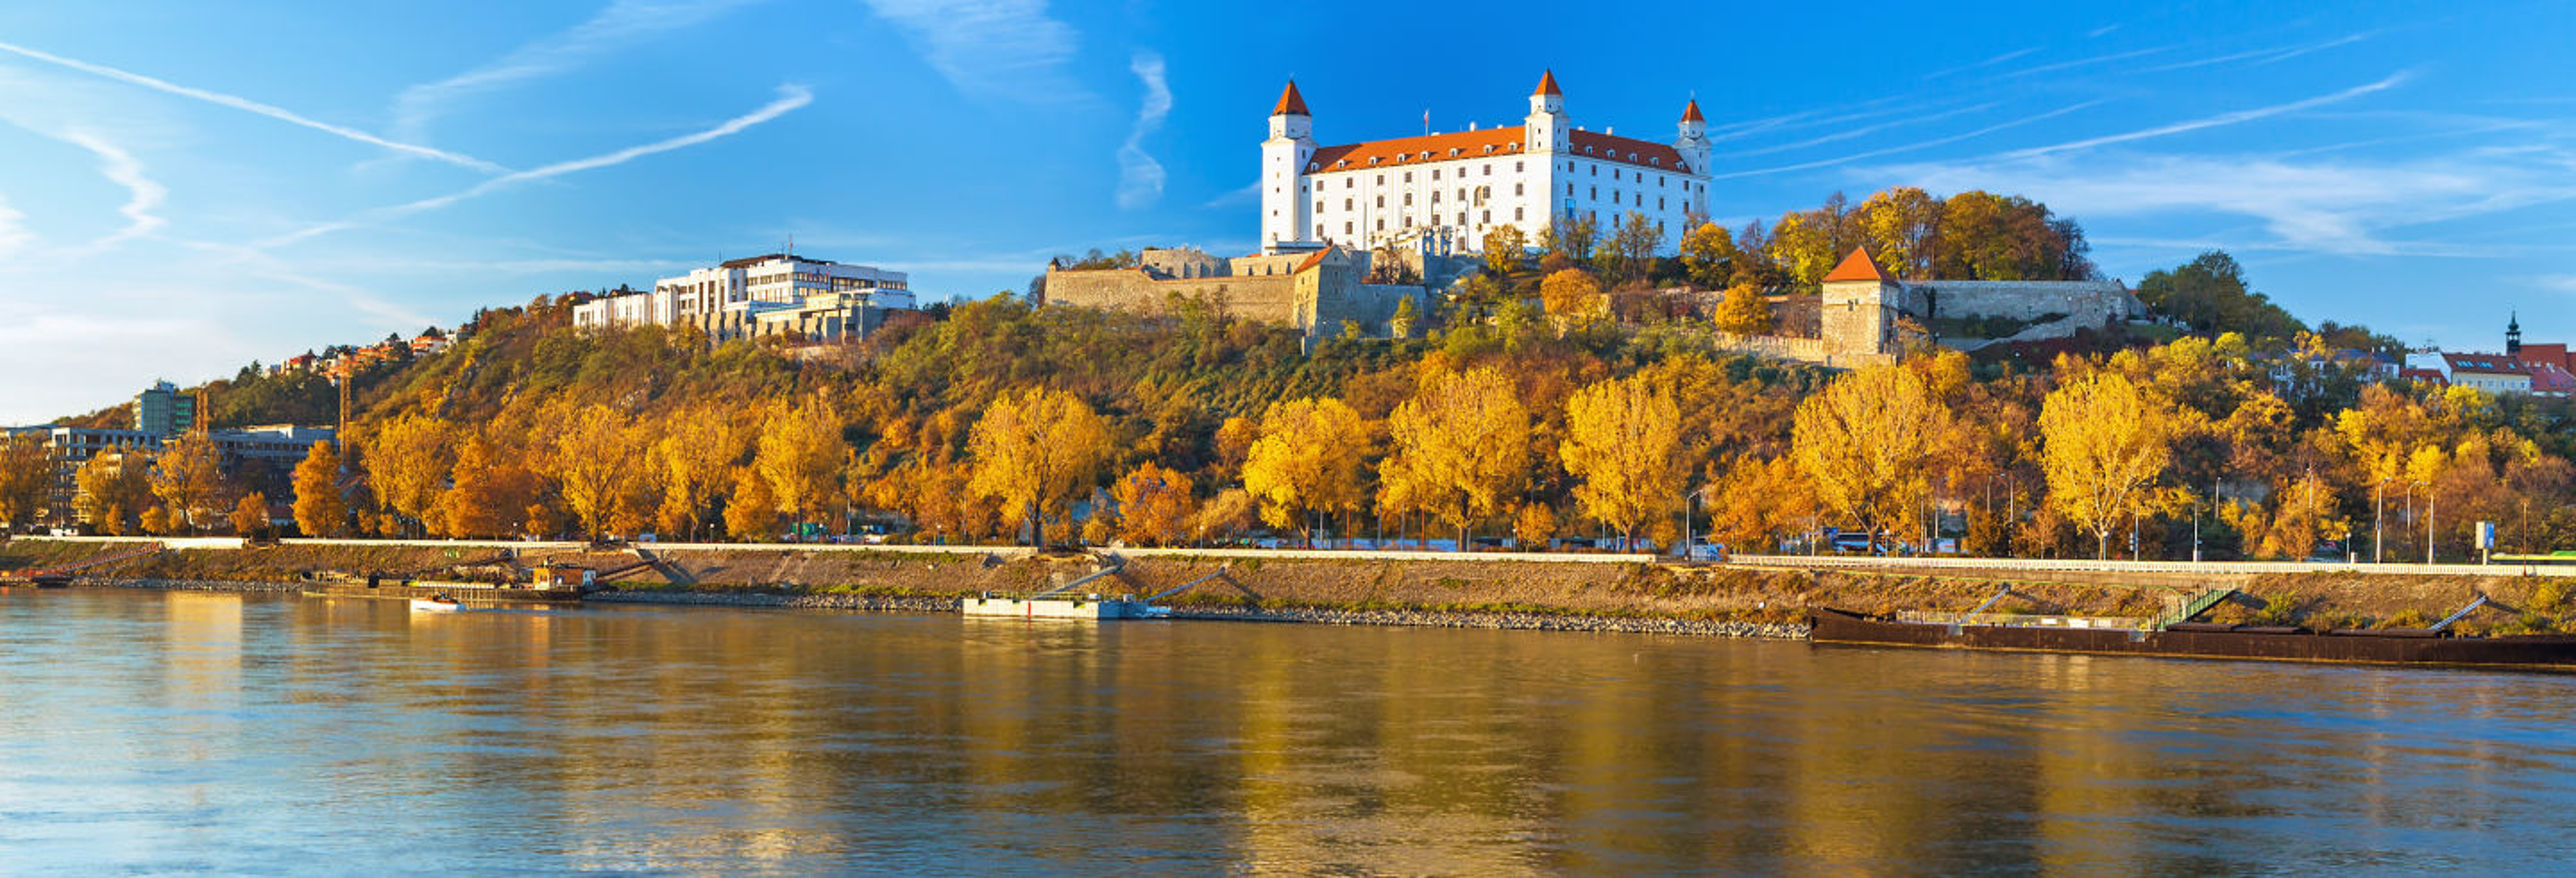 Excursión a Bratislava con regreso en barco